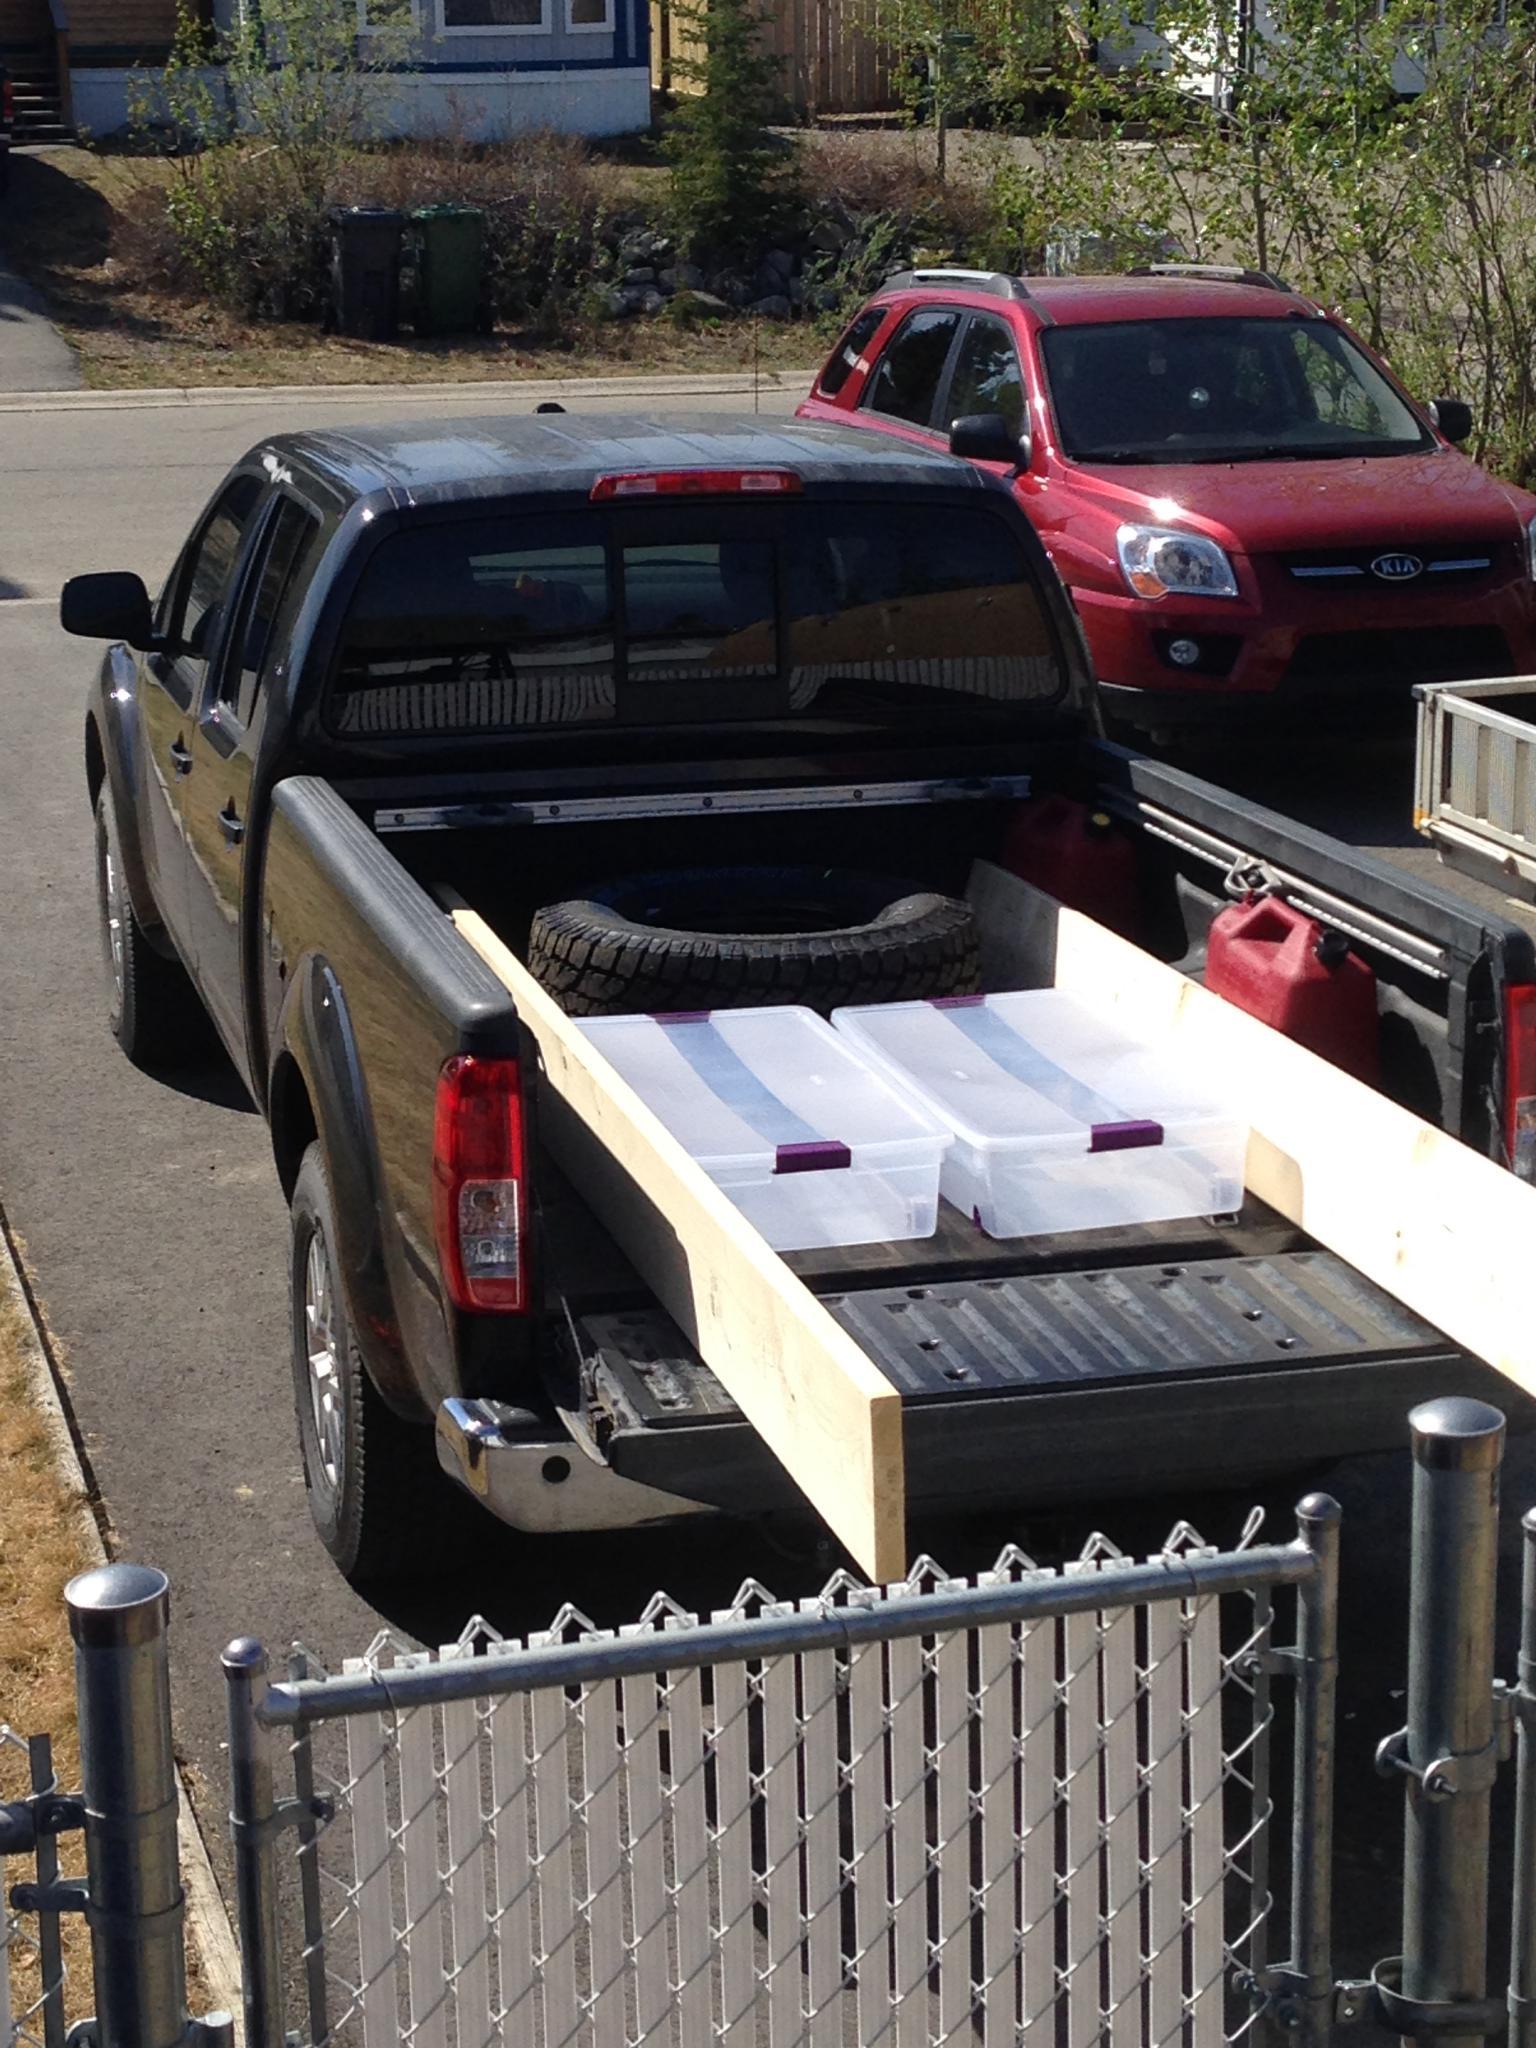 truck bed storage ideas nissan frontier forum. Black Bedroom Furniture Sets. Home Design Ideas